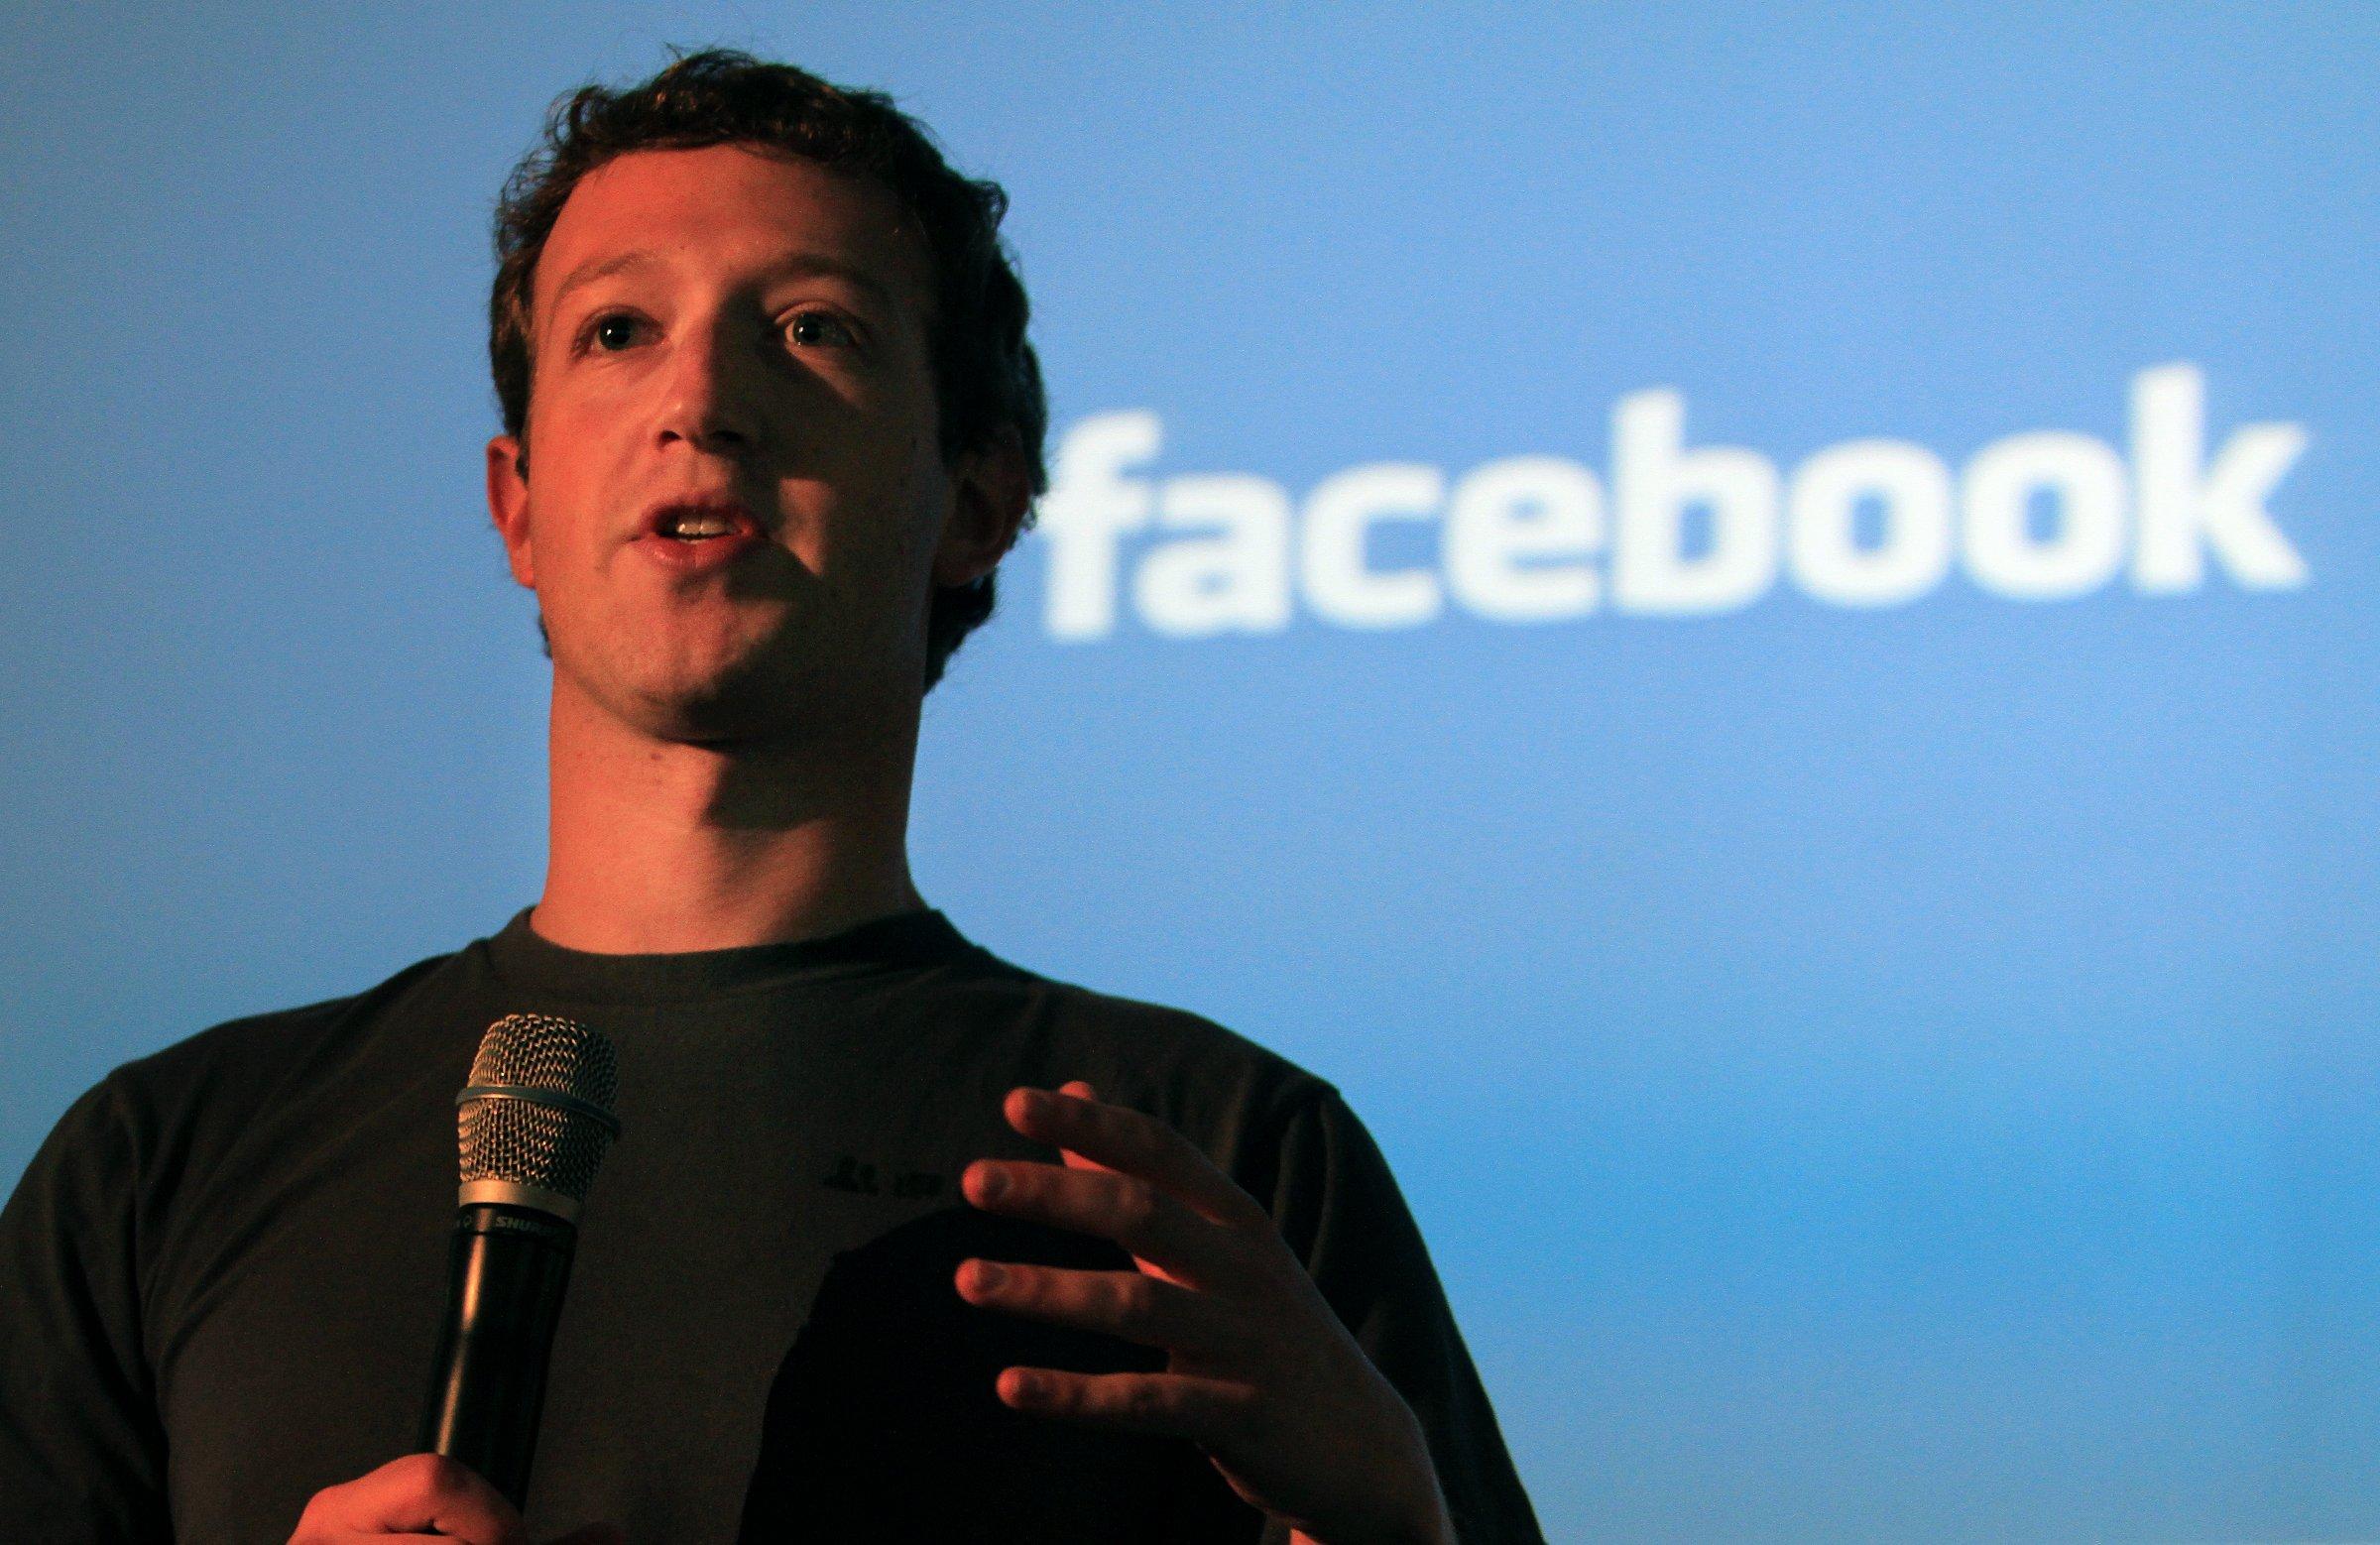 Zuckerberg Sandberg silence during Facebook scandal like putting gasoline on the fire